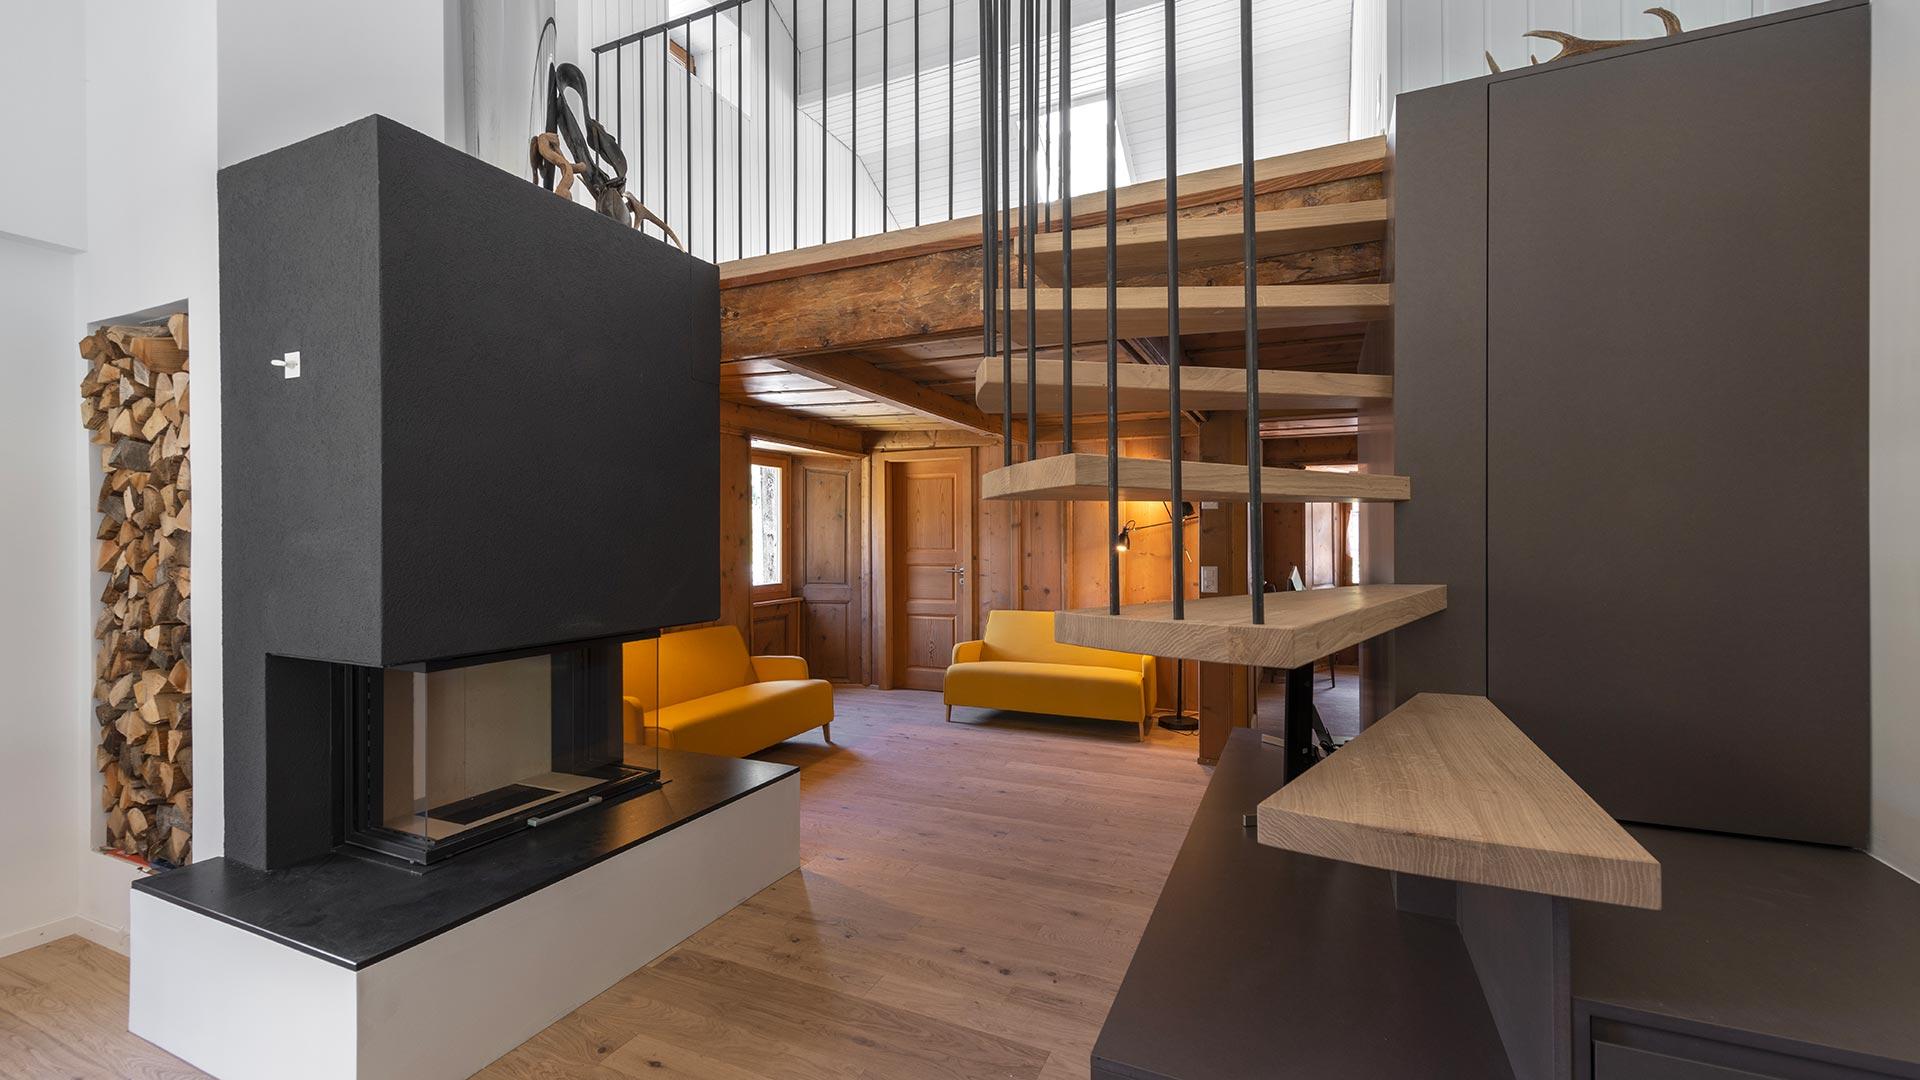 cuisine reno04 - Escaliers tournants, volants...